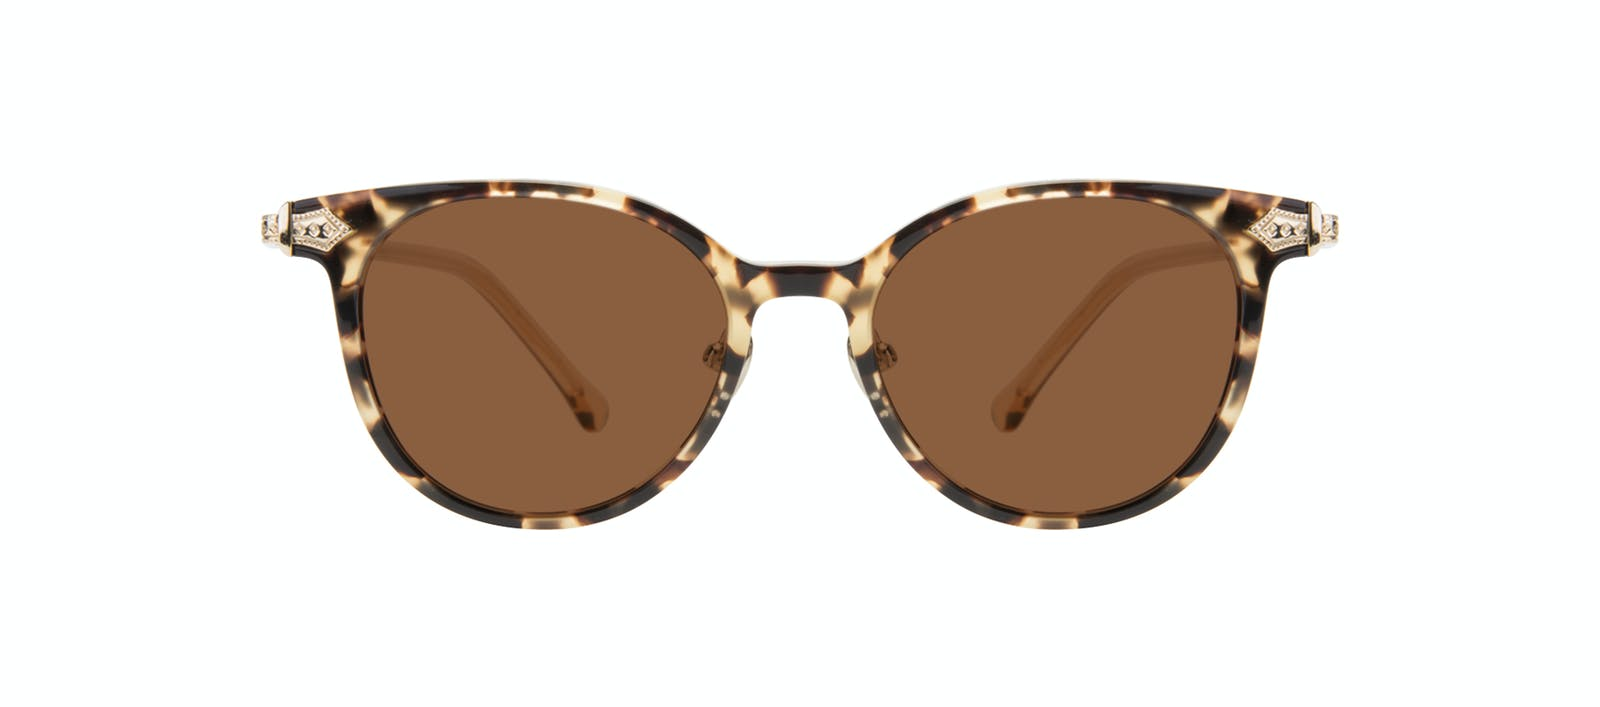 e3d17a2a460 Affordable Fashion Glasses Round Sunglasses Women Gem Golden Chip Front